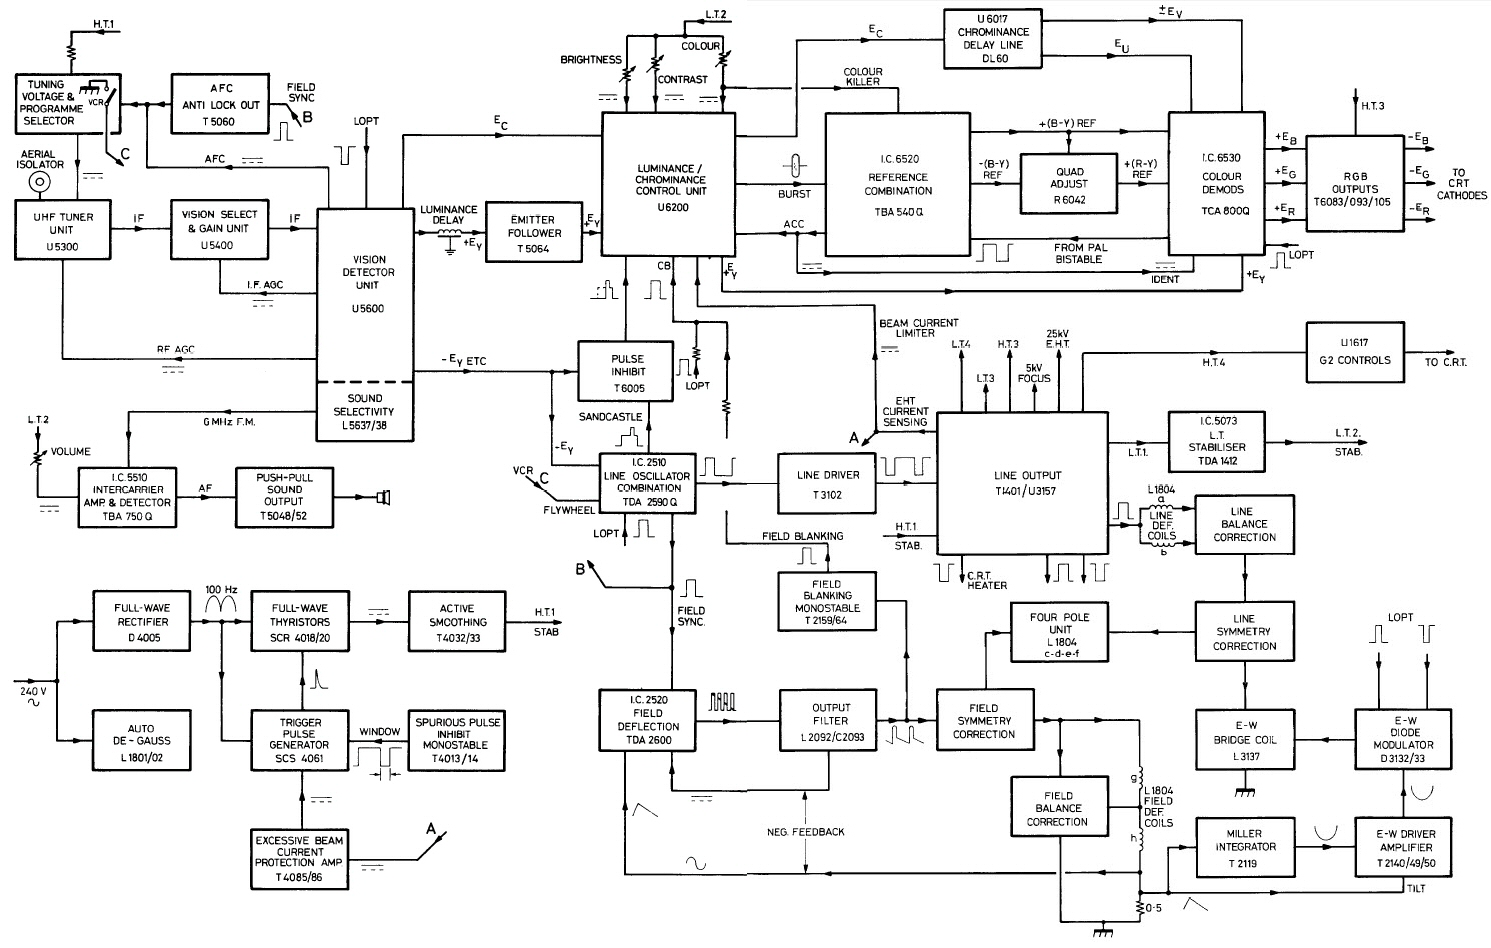 block flow diagram word